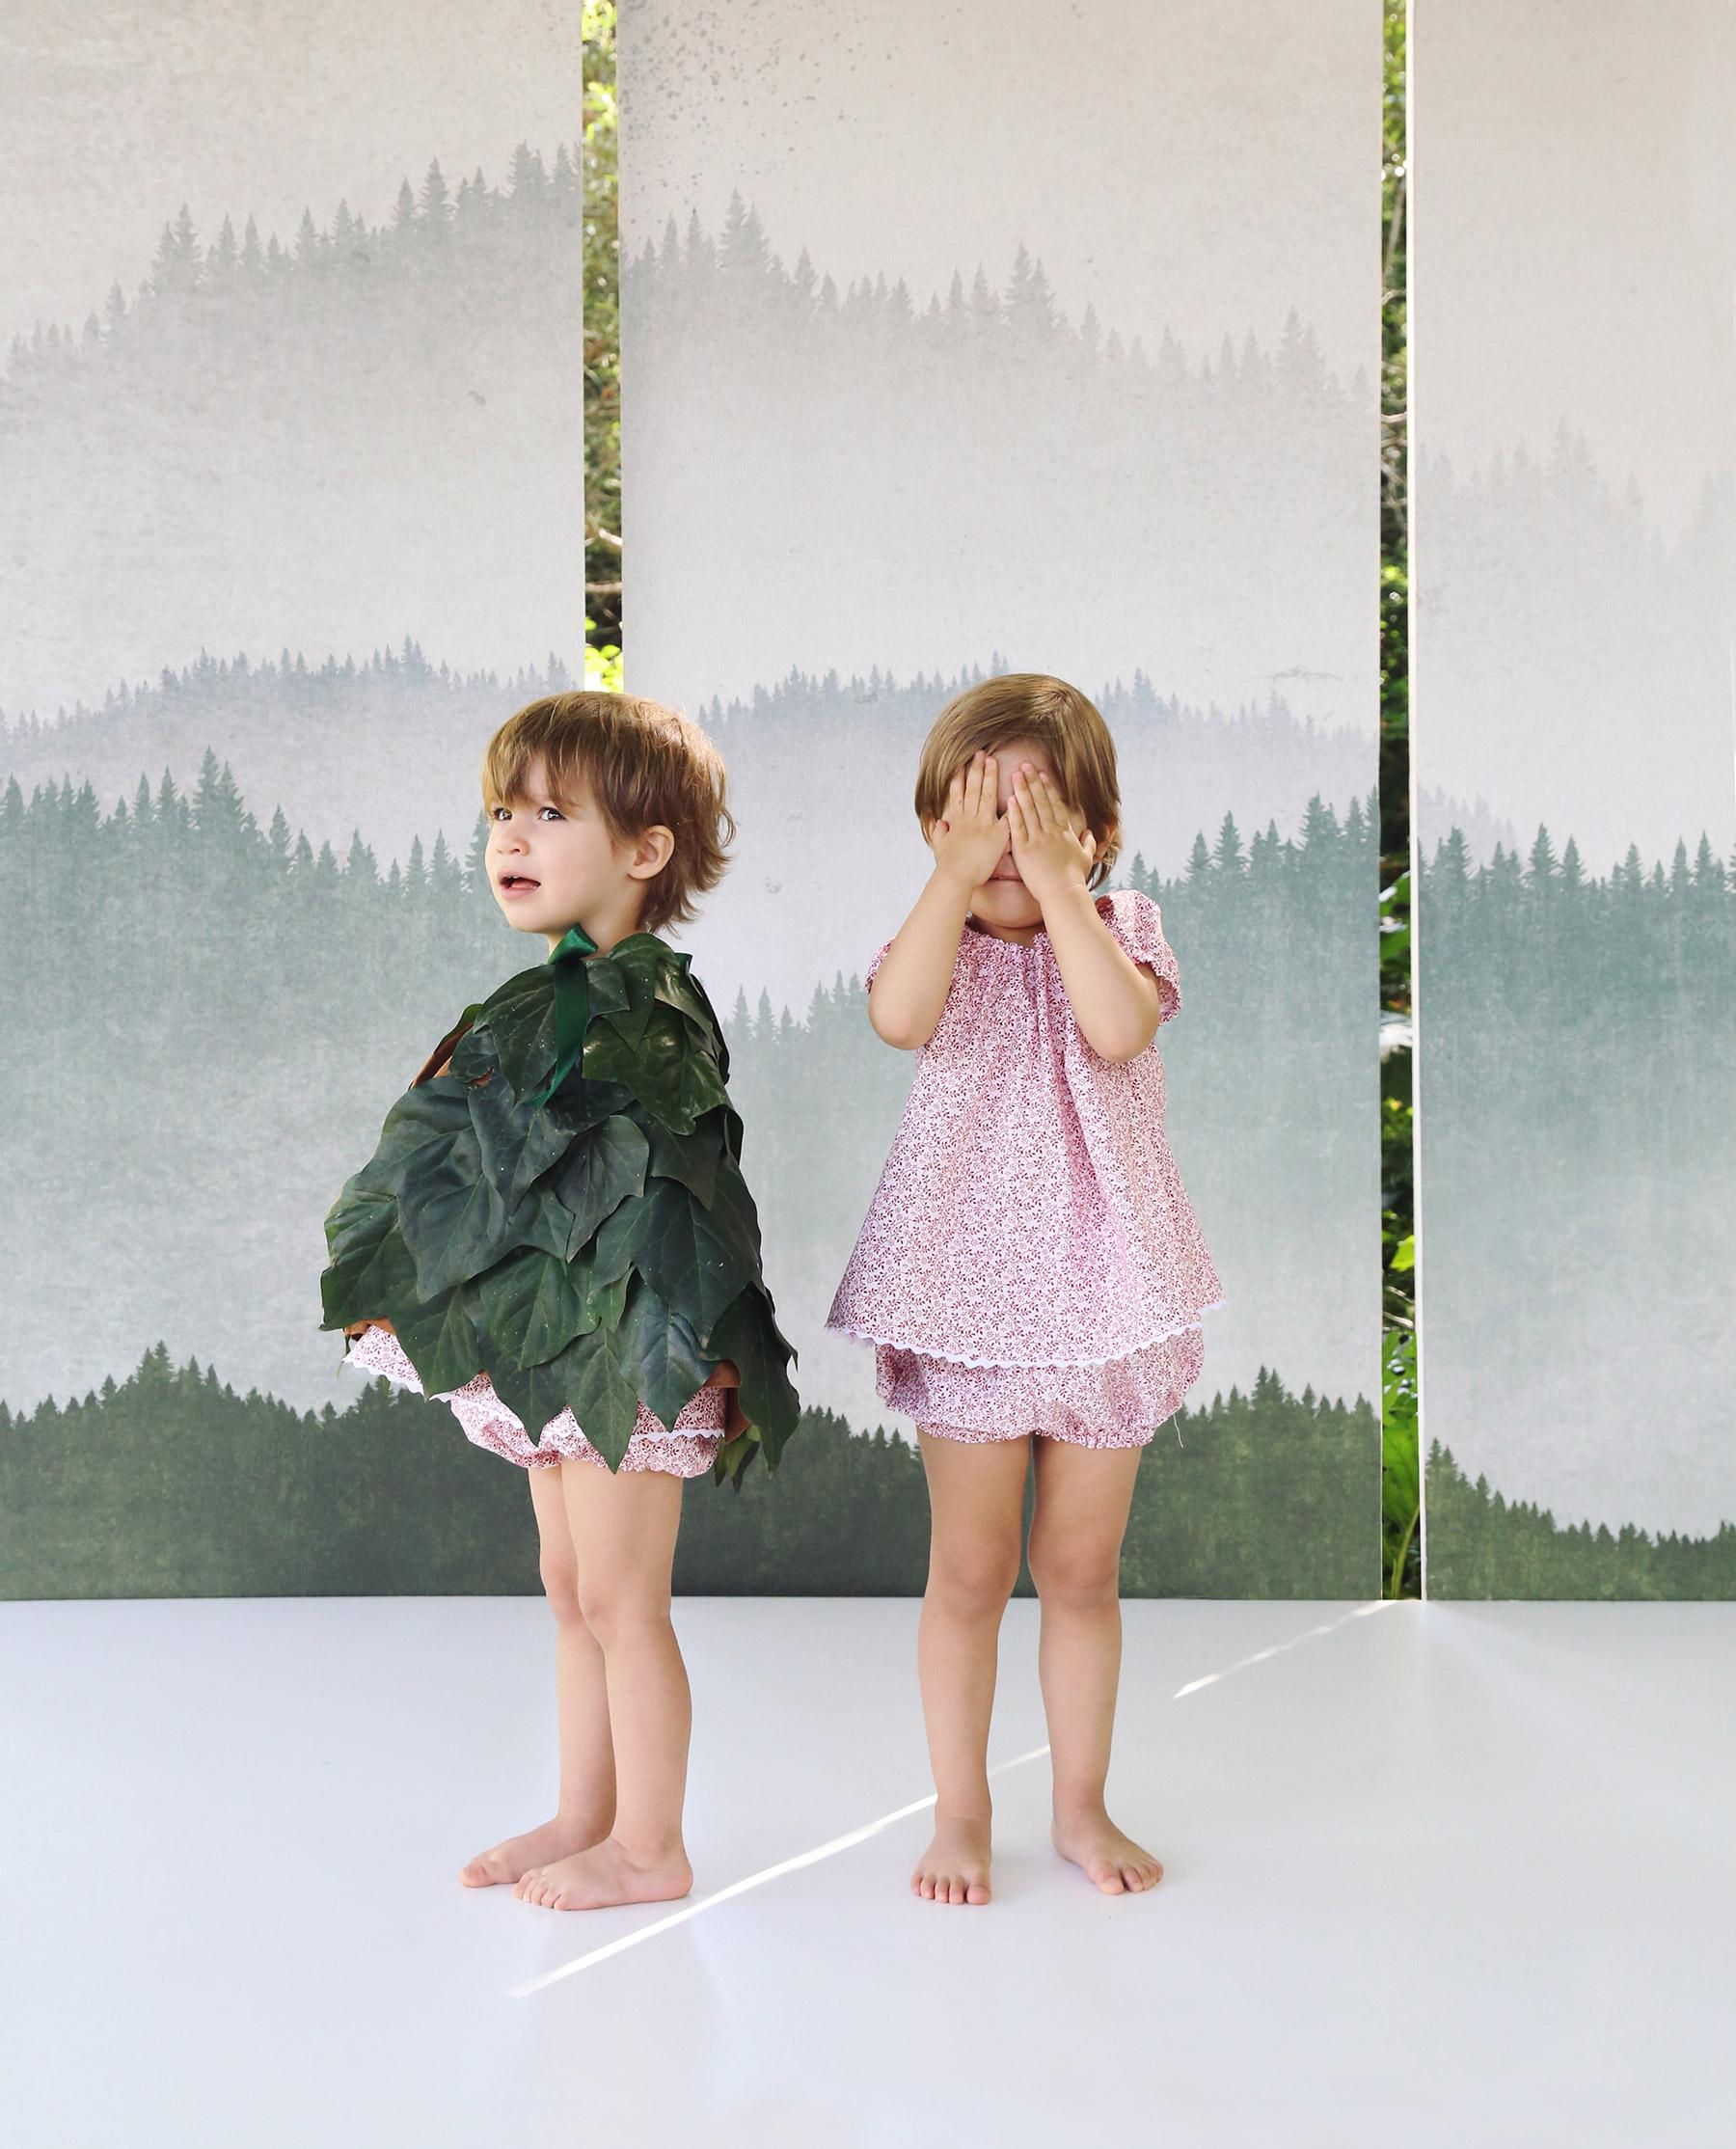 kimmy-and-bear-clothing-2